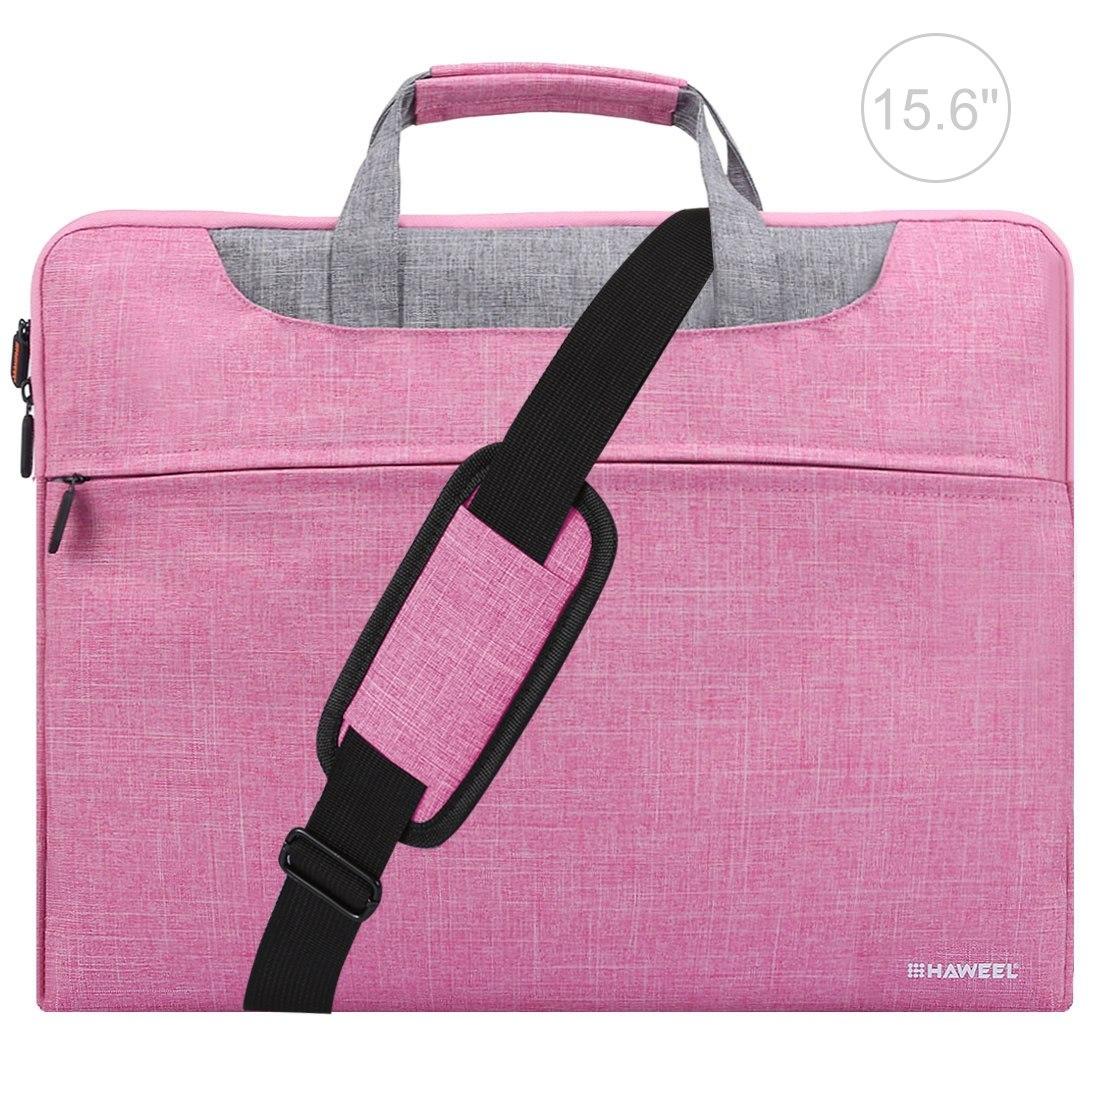 HAWEEL Handhållen laptopväska med axelrem   dragkedja  2c7bec7ab6f1e